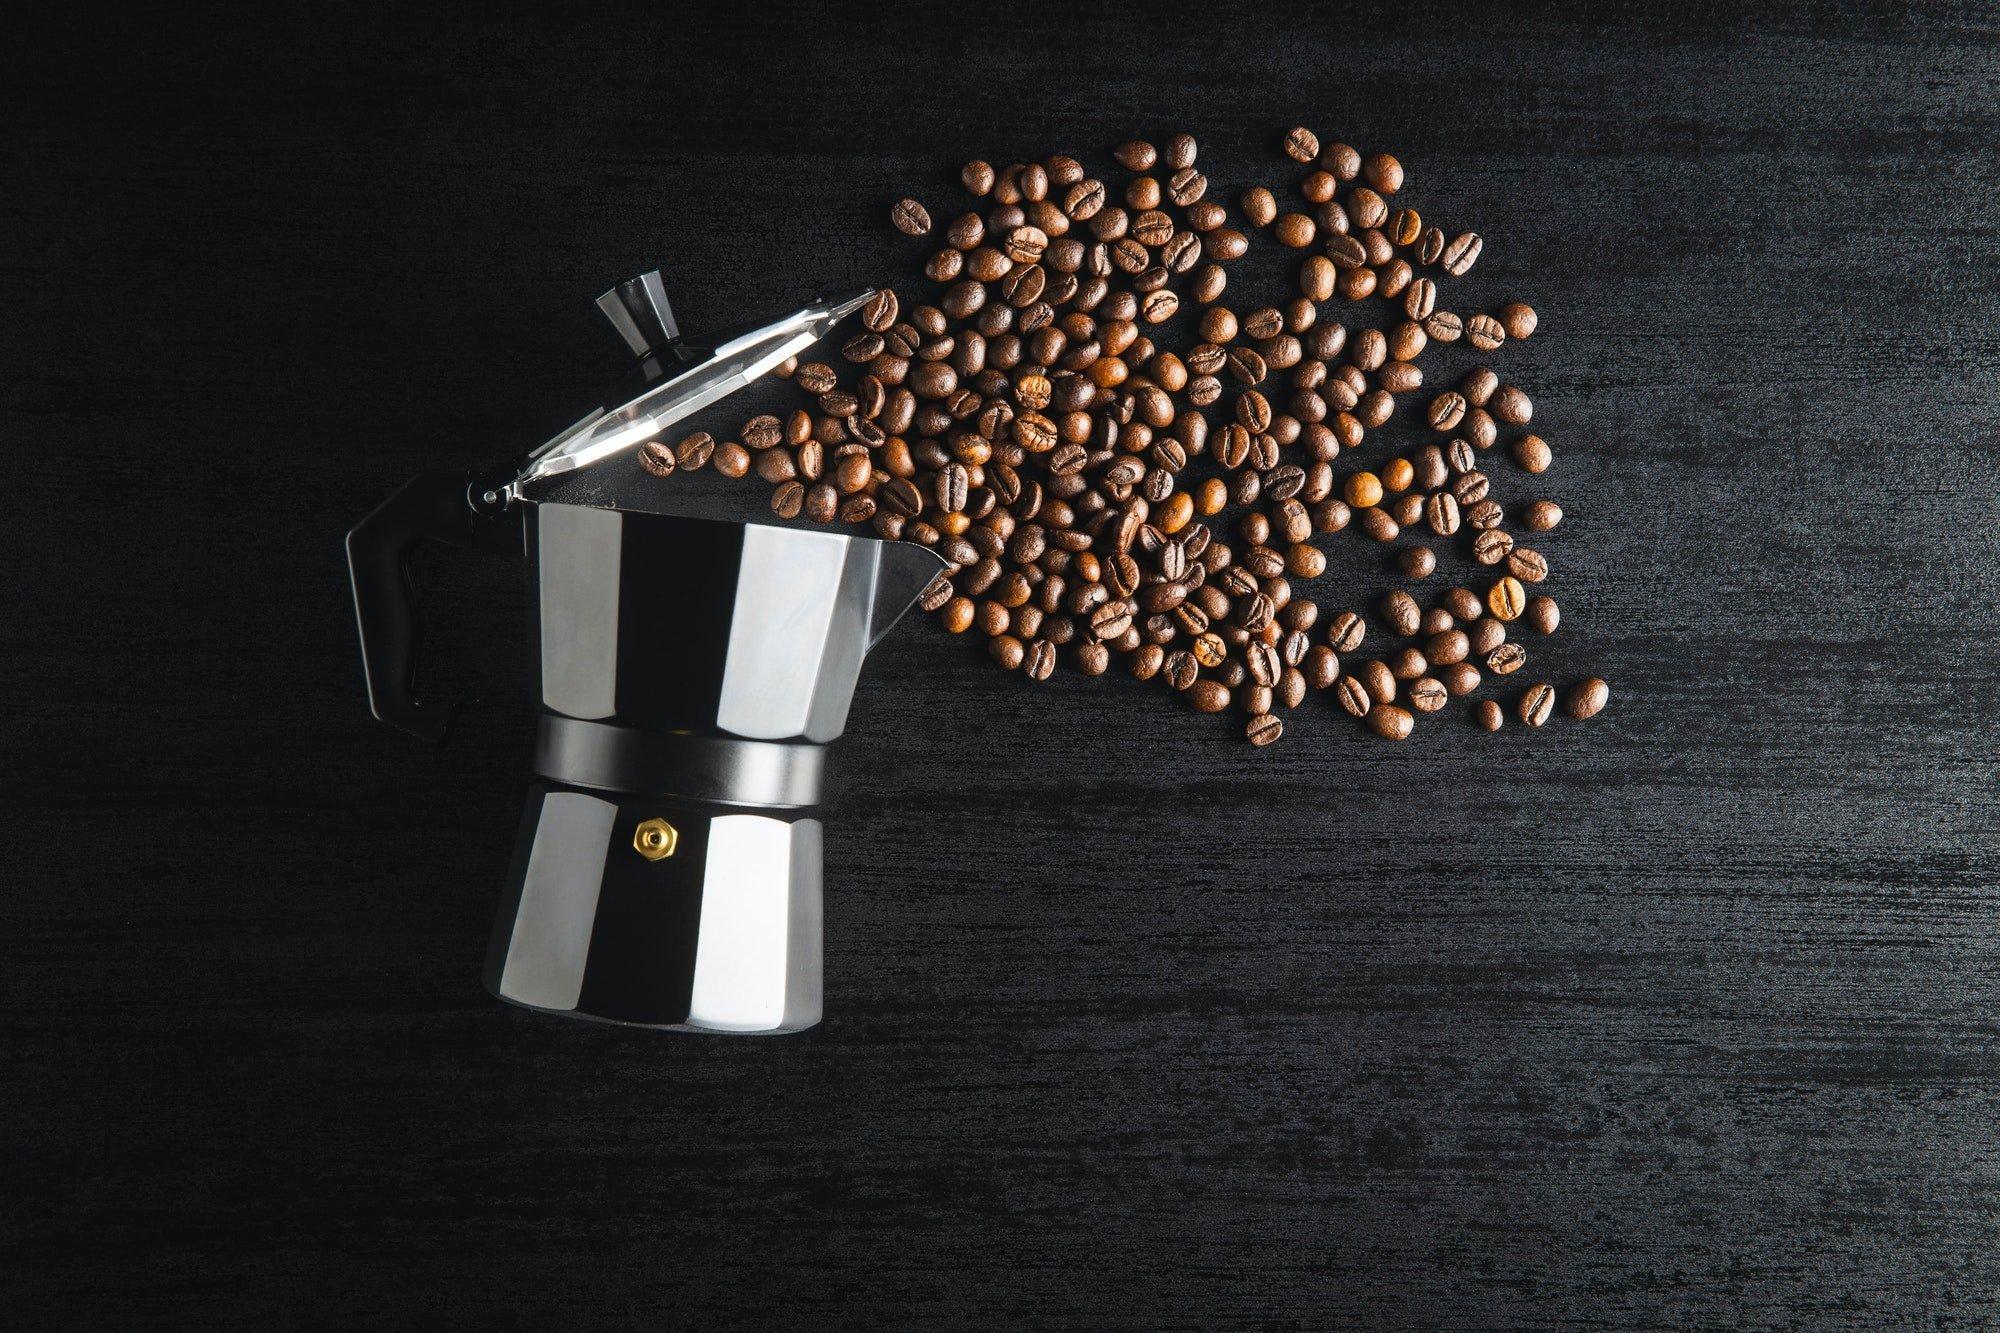 Coffee beans and bialetti coffee maker. Moka pot